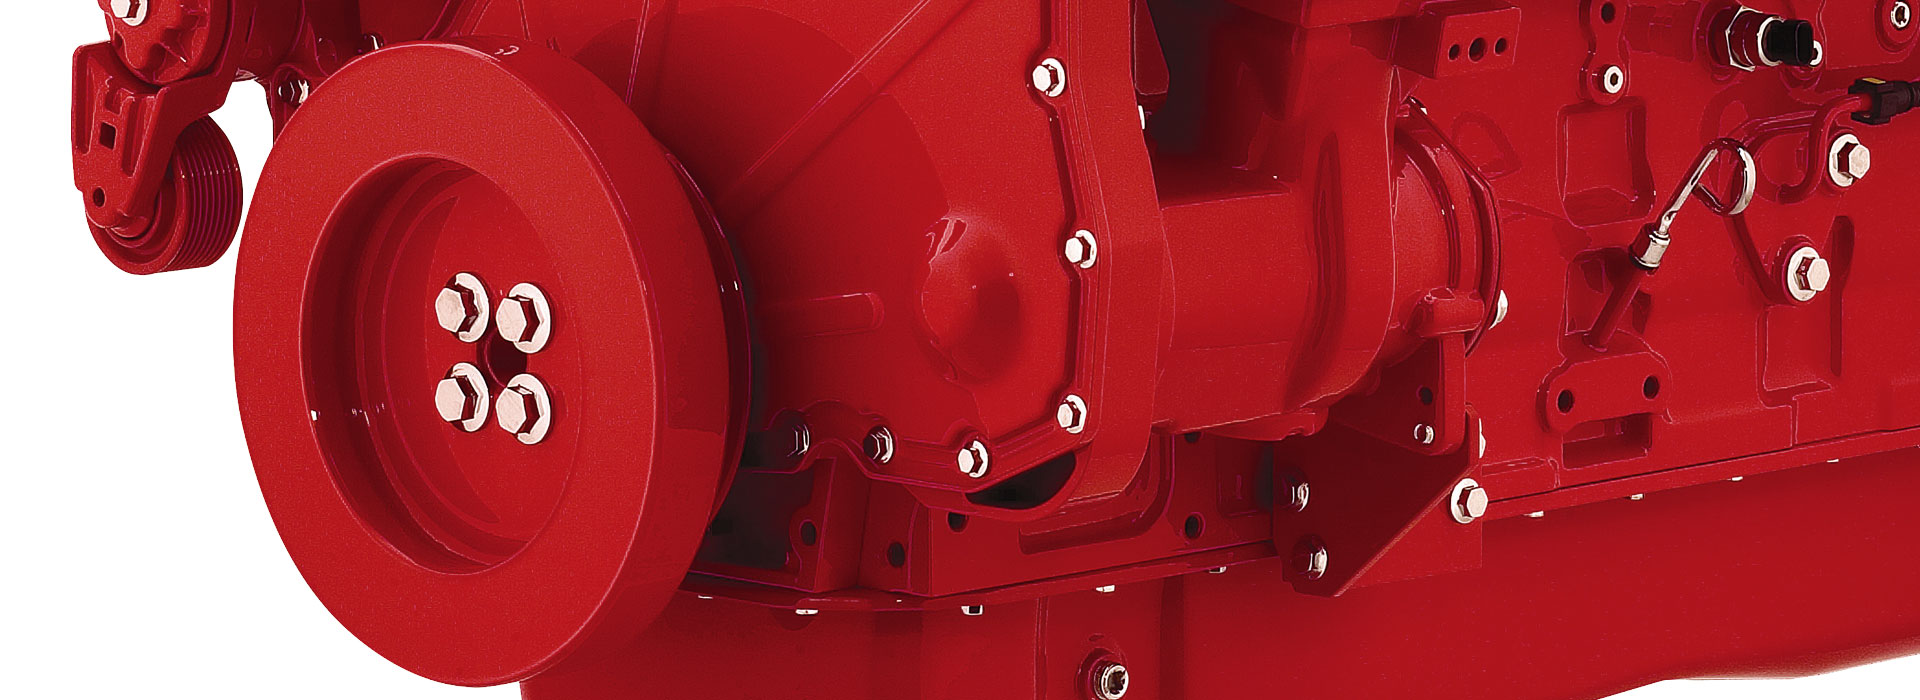 Cummins ISL Euro 5  Mid-Range Truck Engines - Western Star